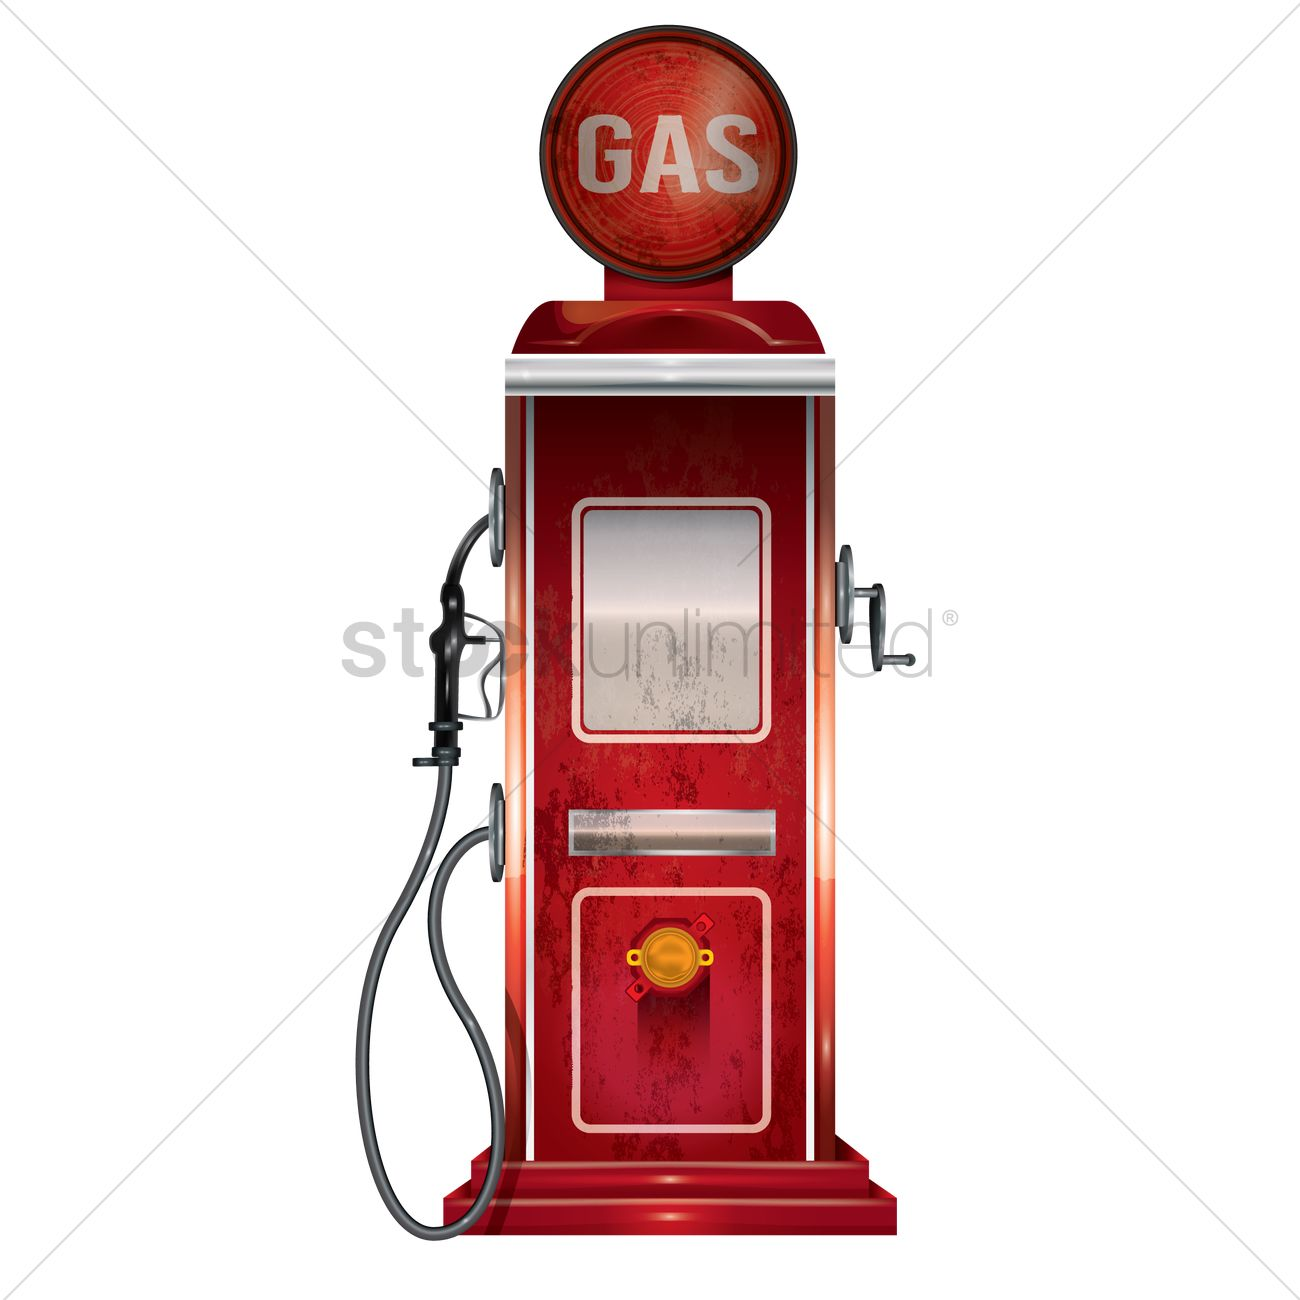 Vintage gas pump Vector Image - 1826522 | StockUnlimited